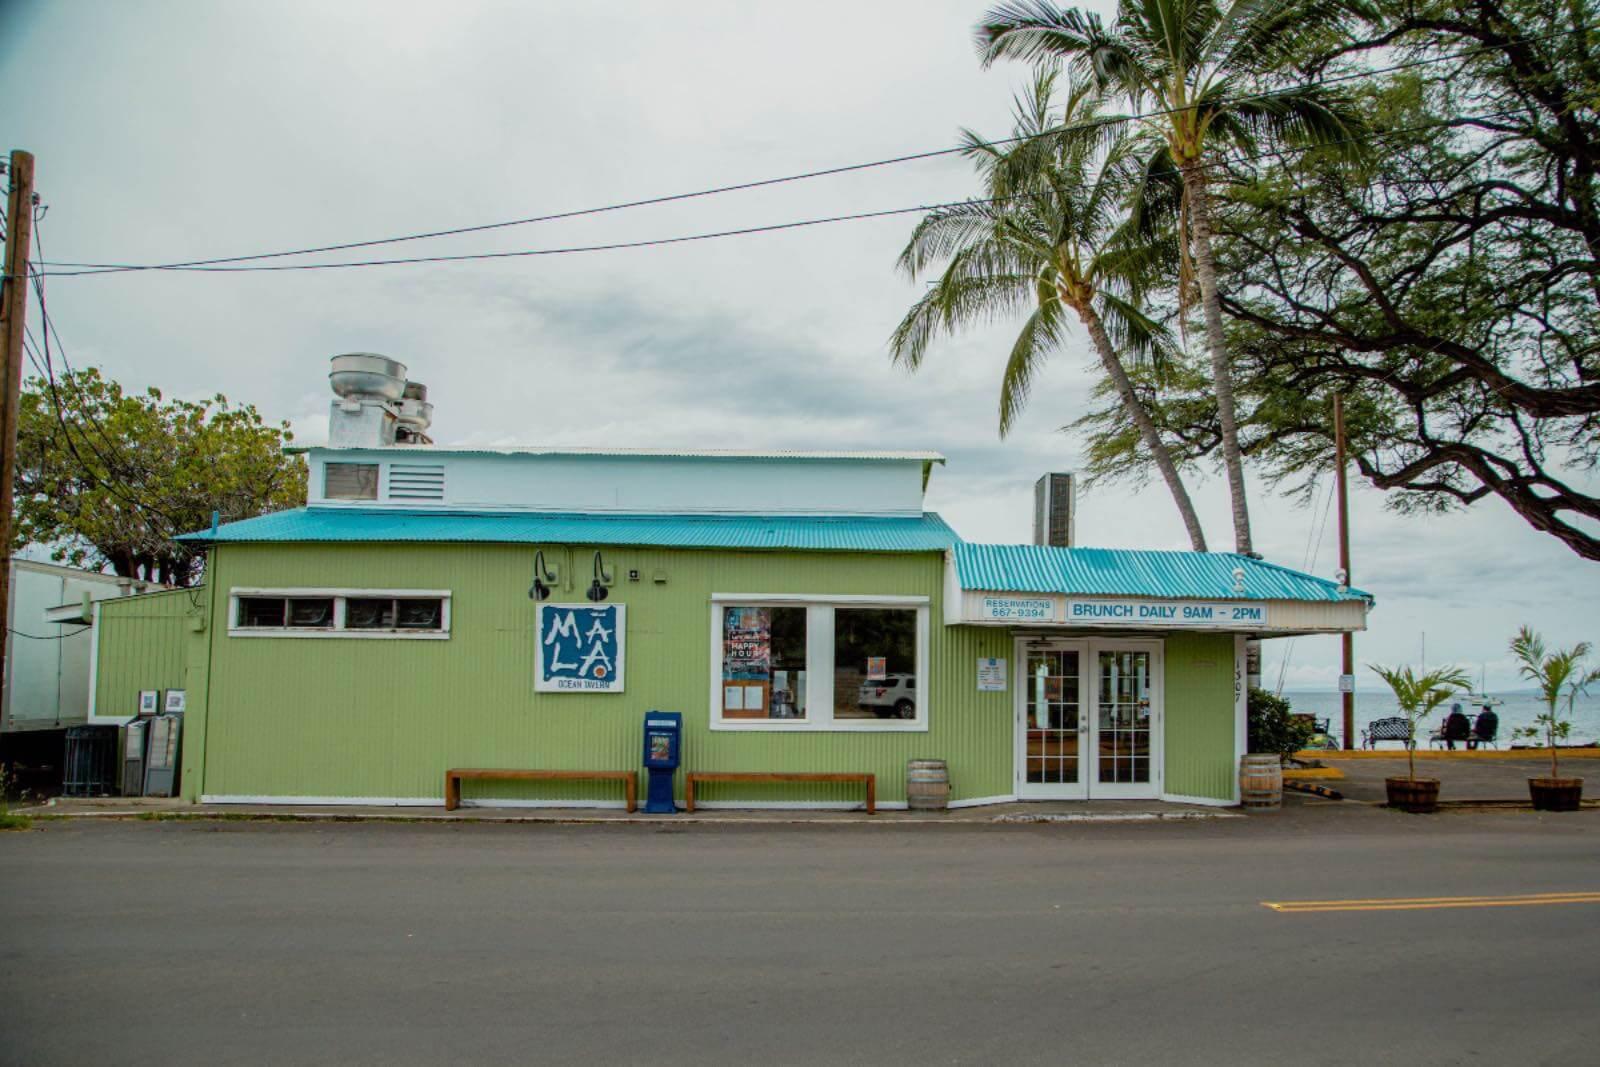 Mala restaurant on Front street Lahaina, Maui